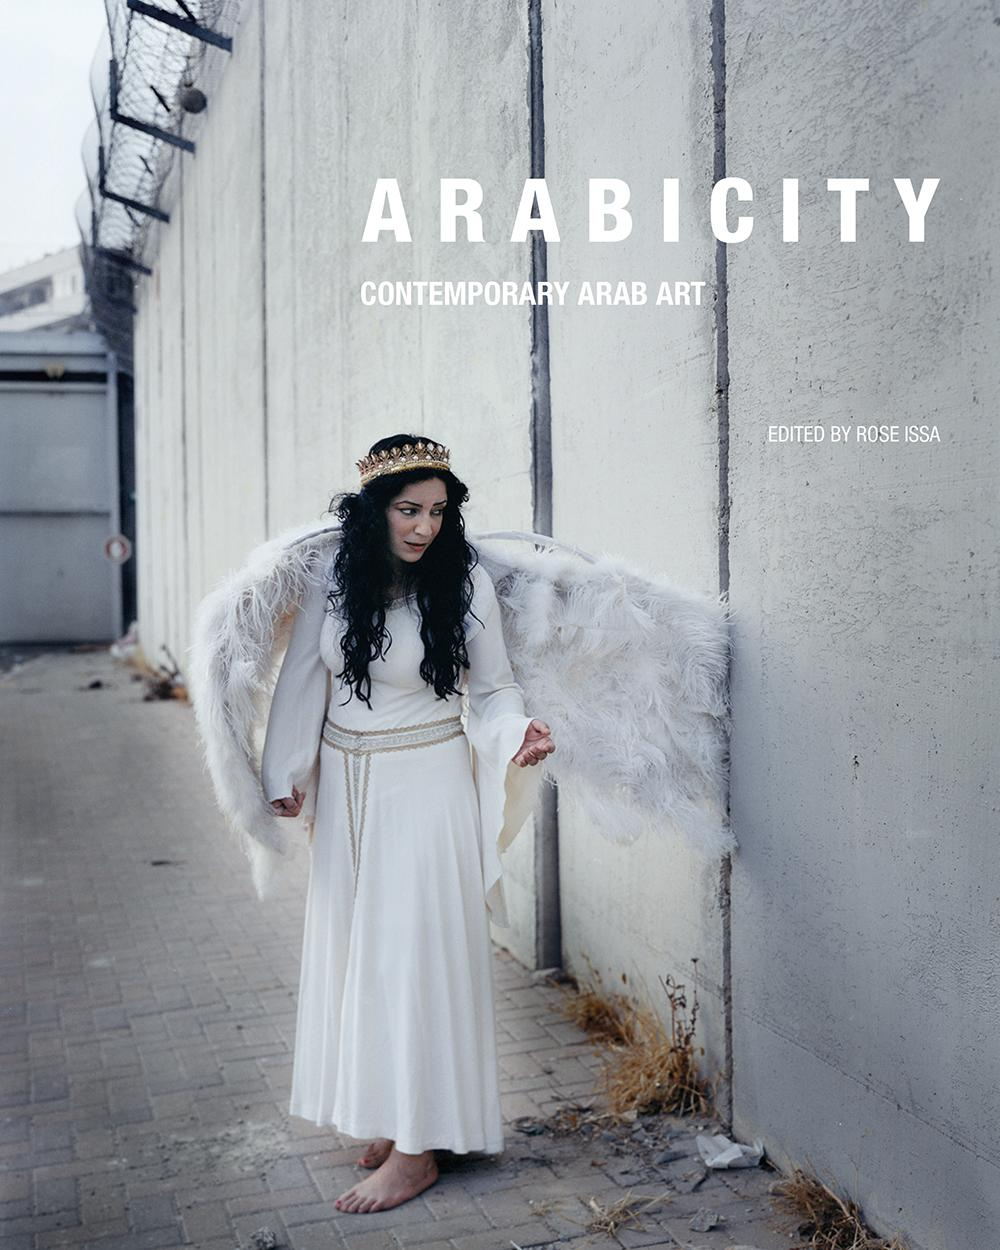 Arabicity